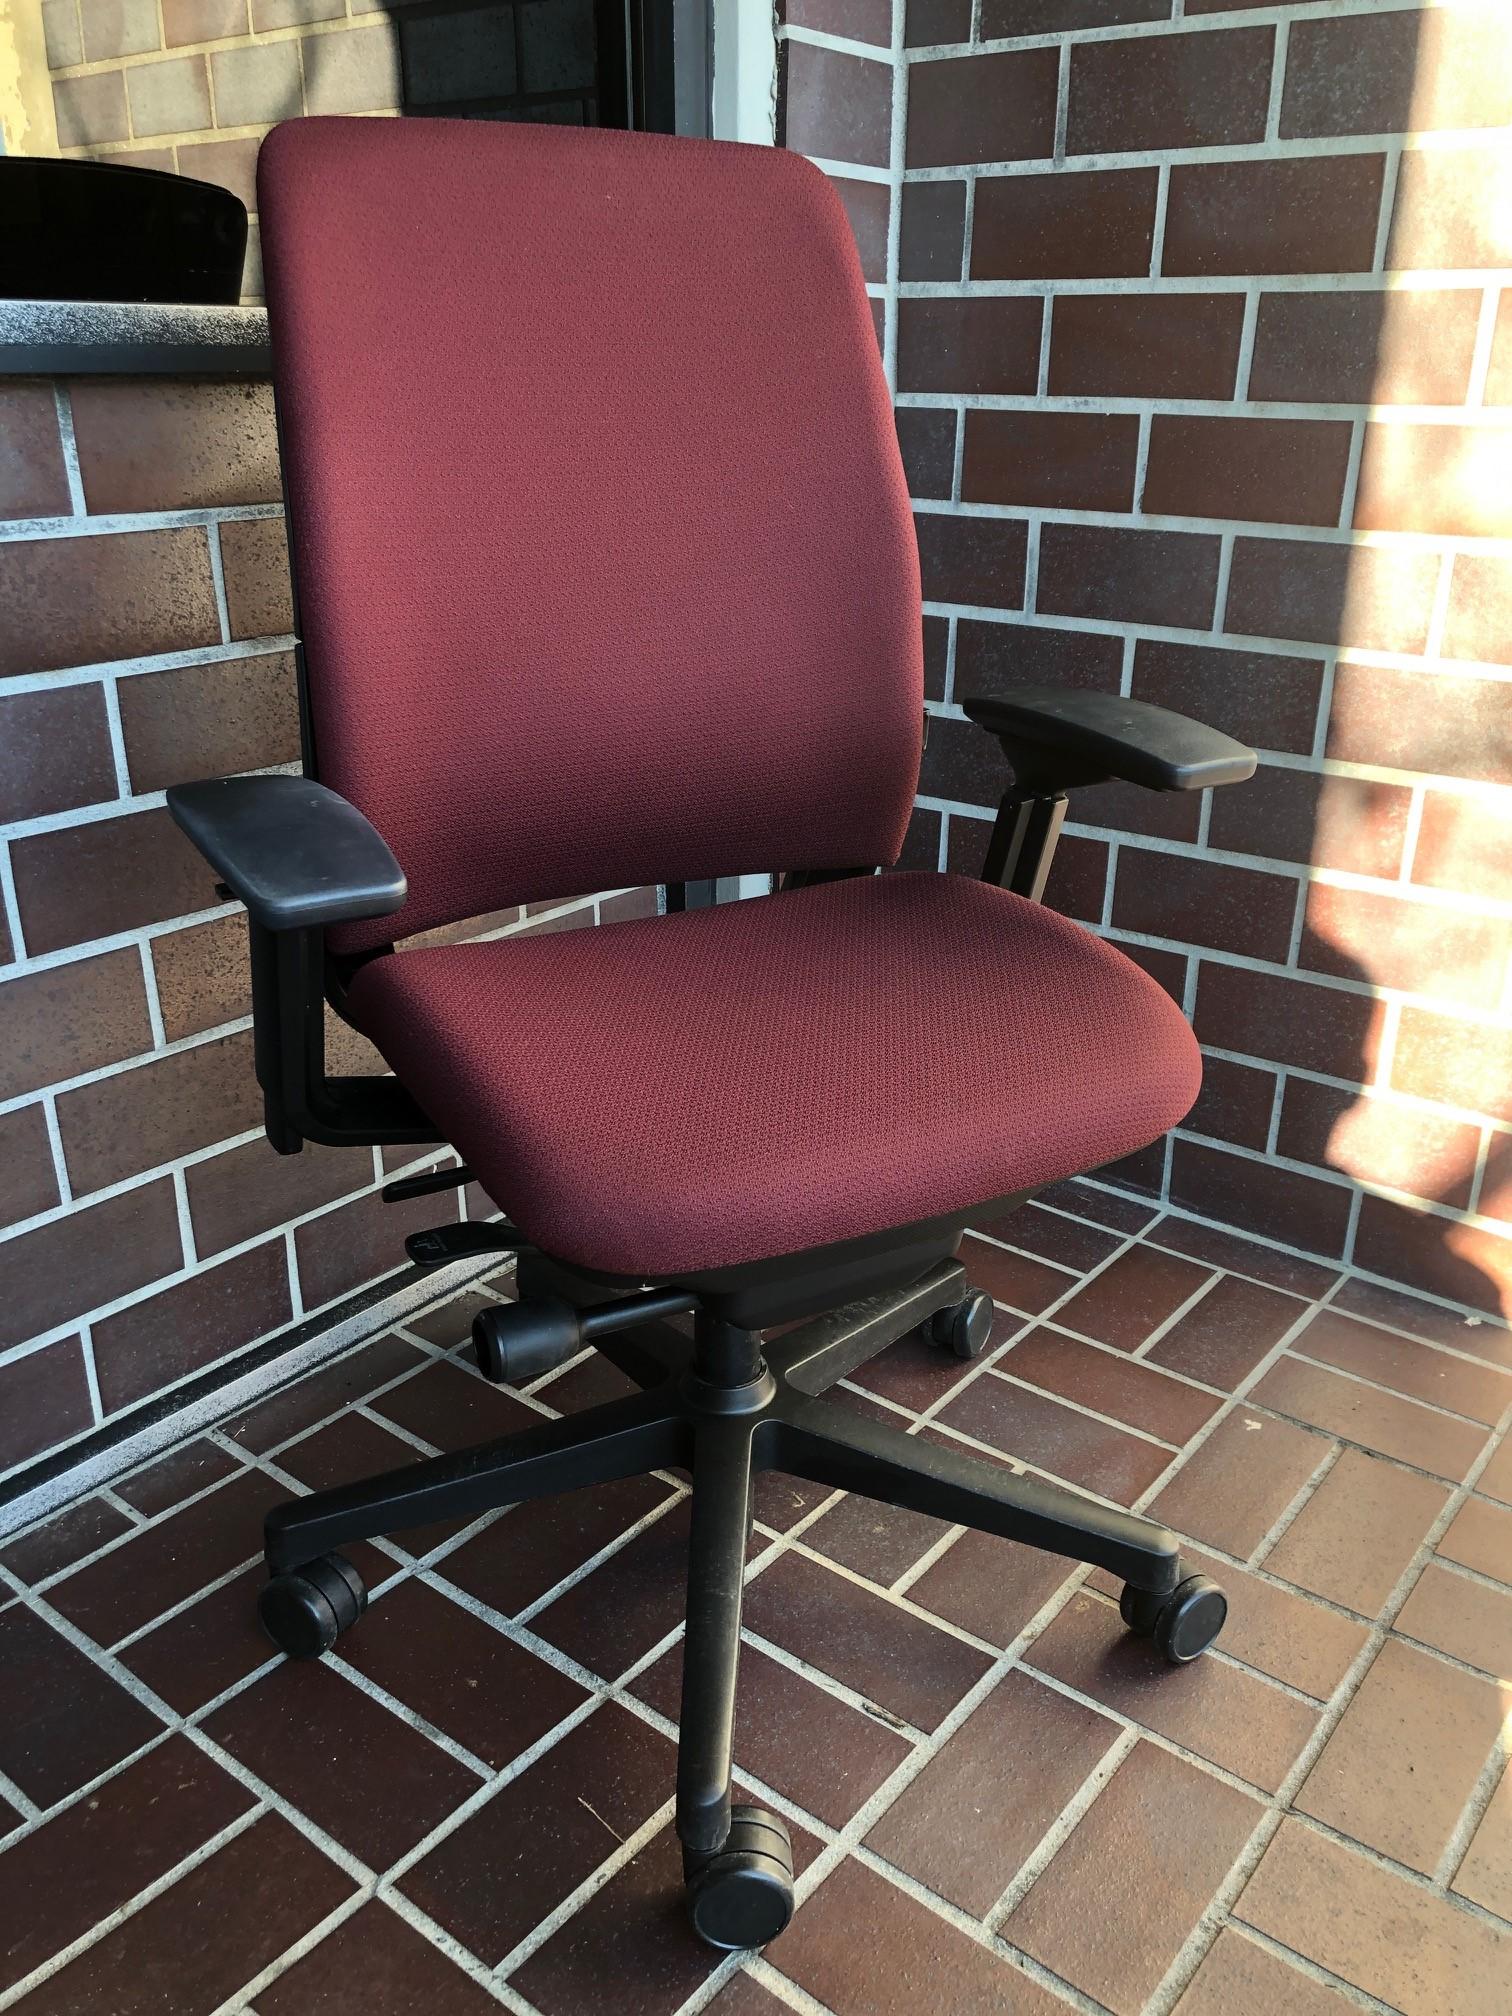 Amia desk chair